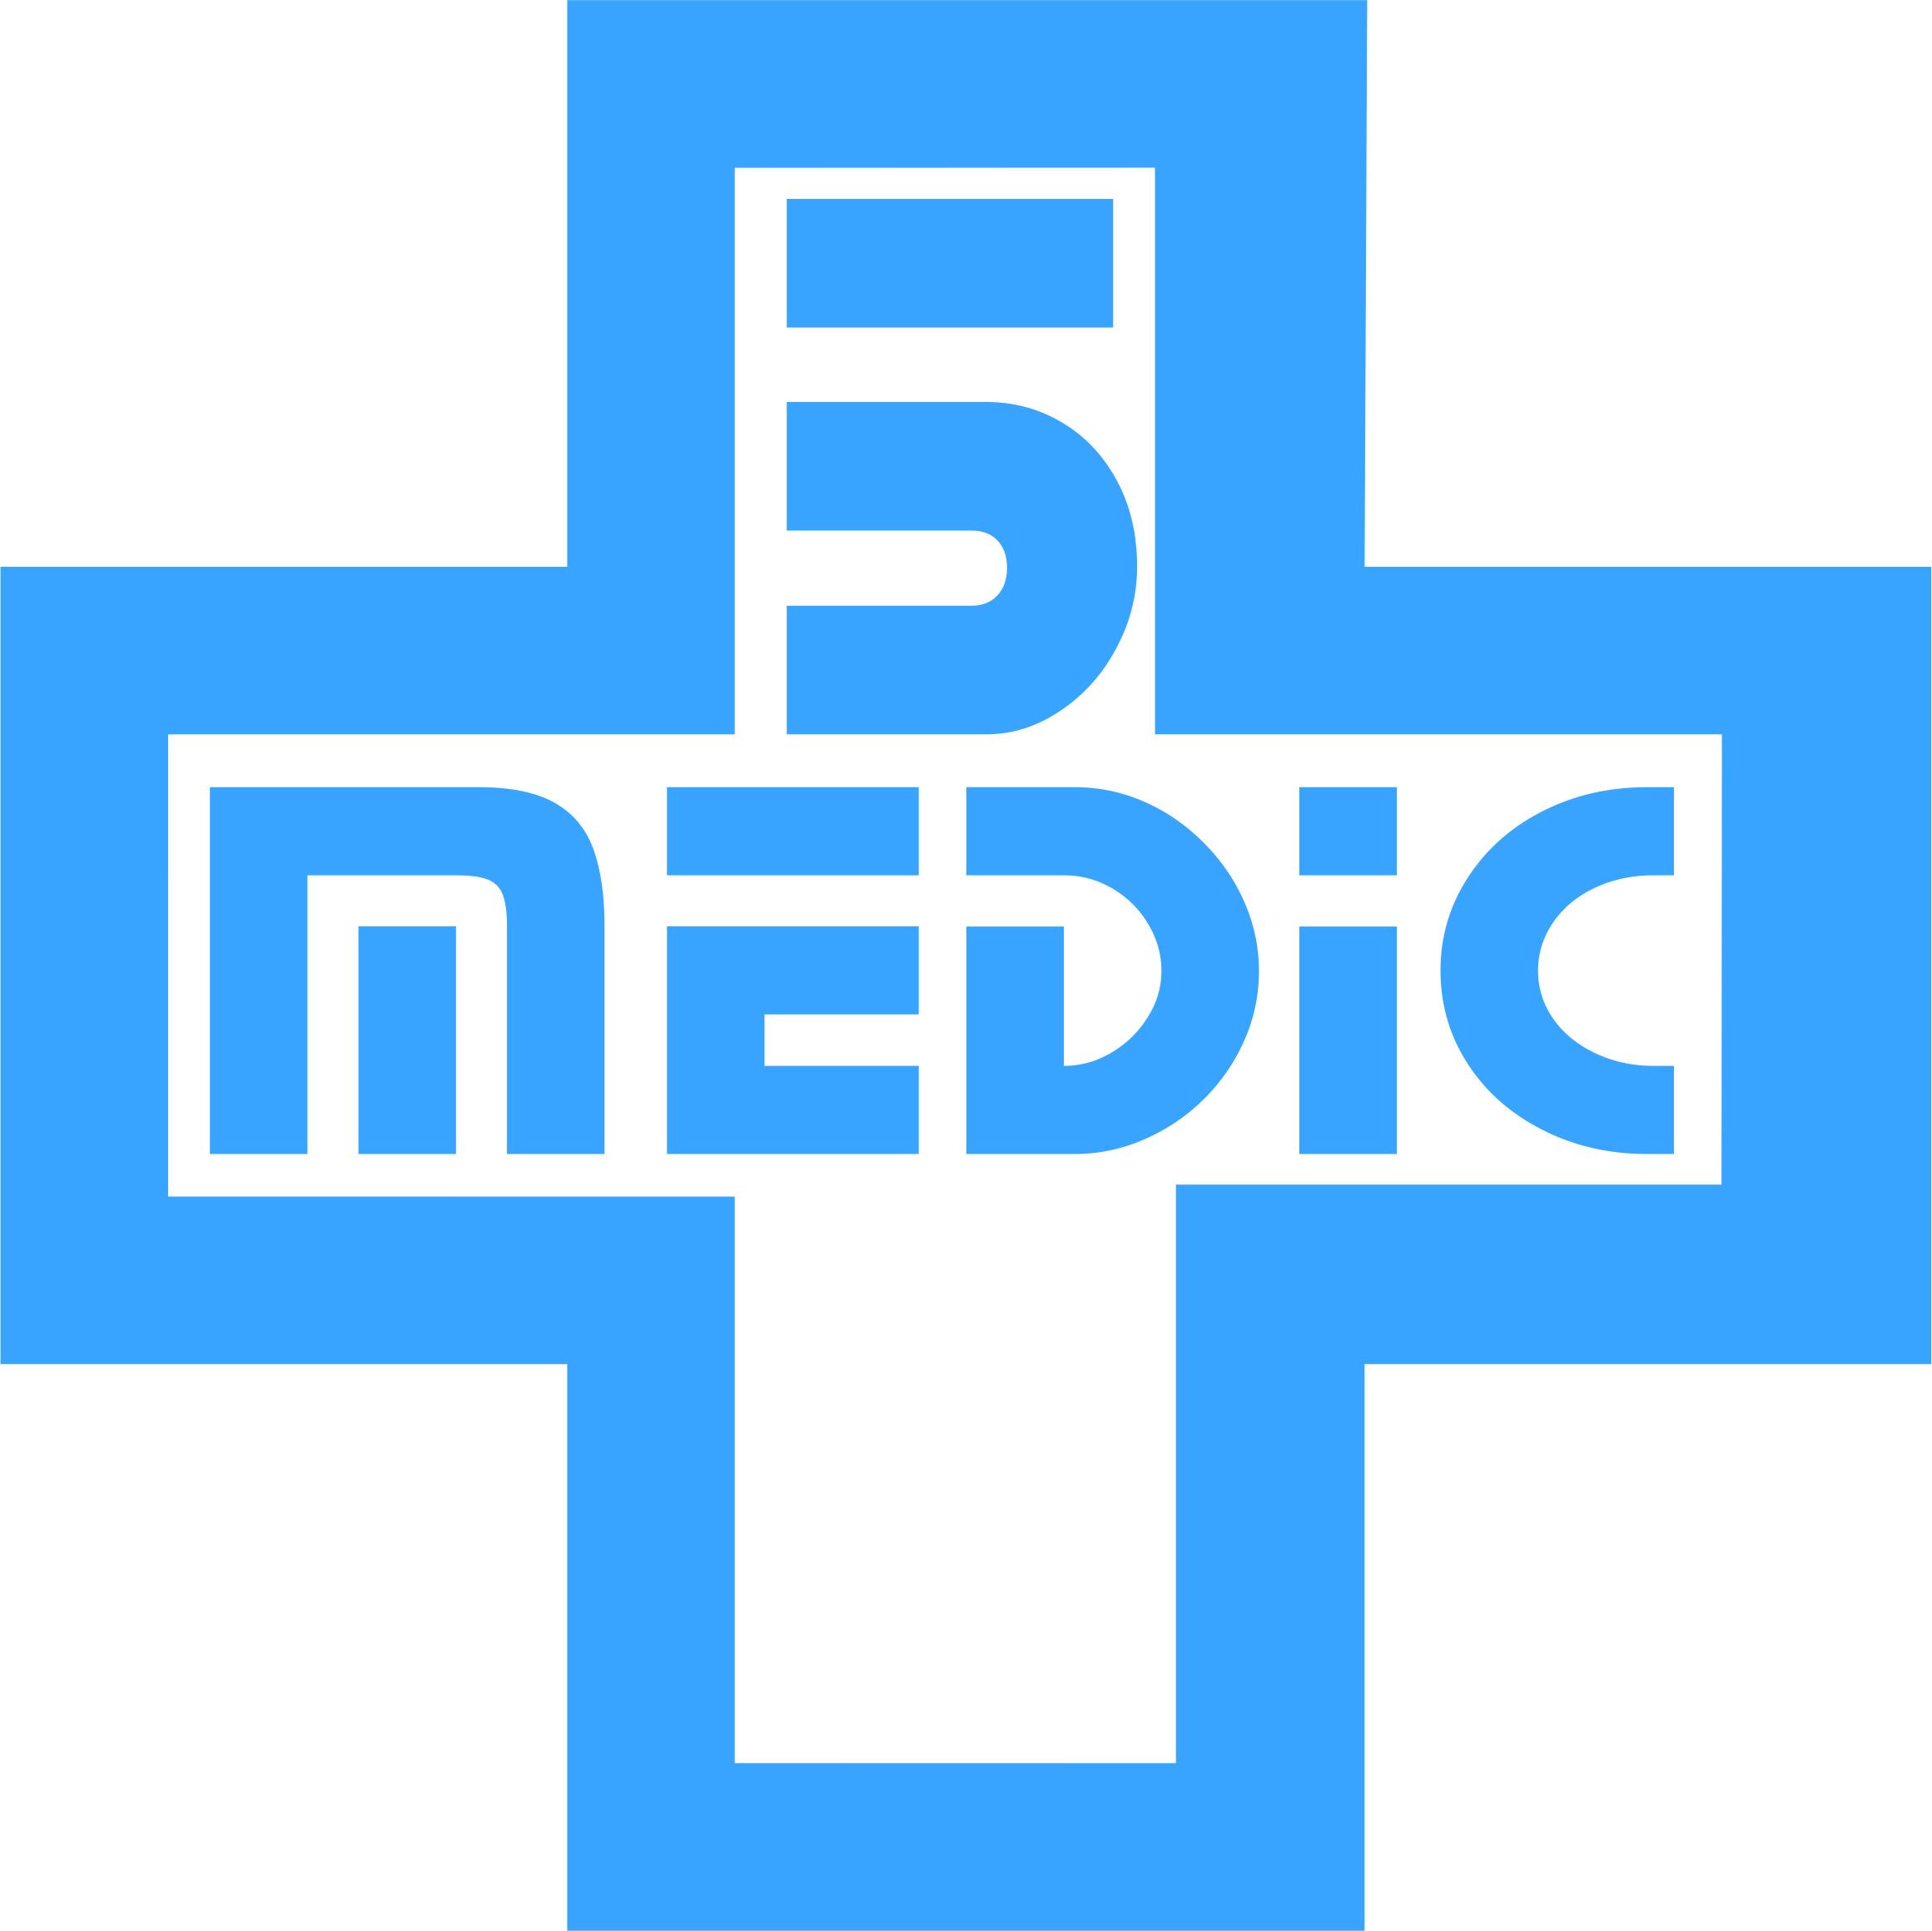 Готовый логотип или эскиз (мед. тематика) фото f_05155aba90538db3.jpg